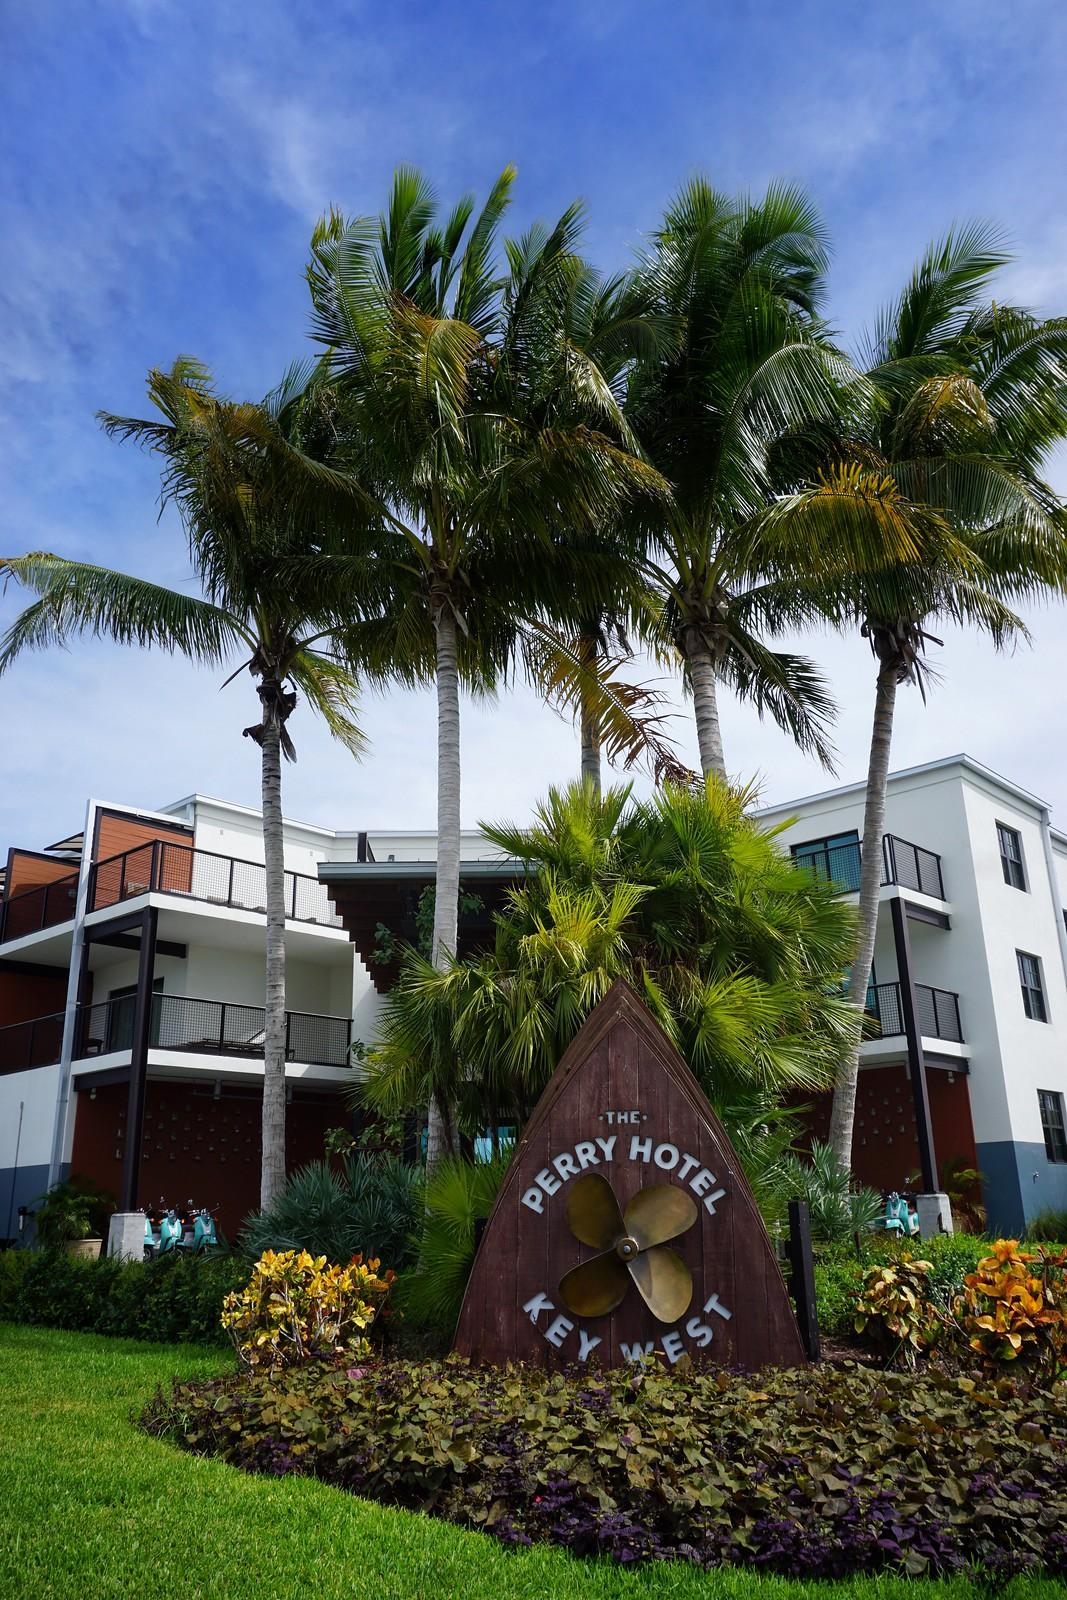 perry-hotel-stock-island-ultimate-road-trip-5-days-florida-keys-itinerary-what-to-do-key-west-key-largo-islamorada-marathon-miami-vacation-guide